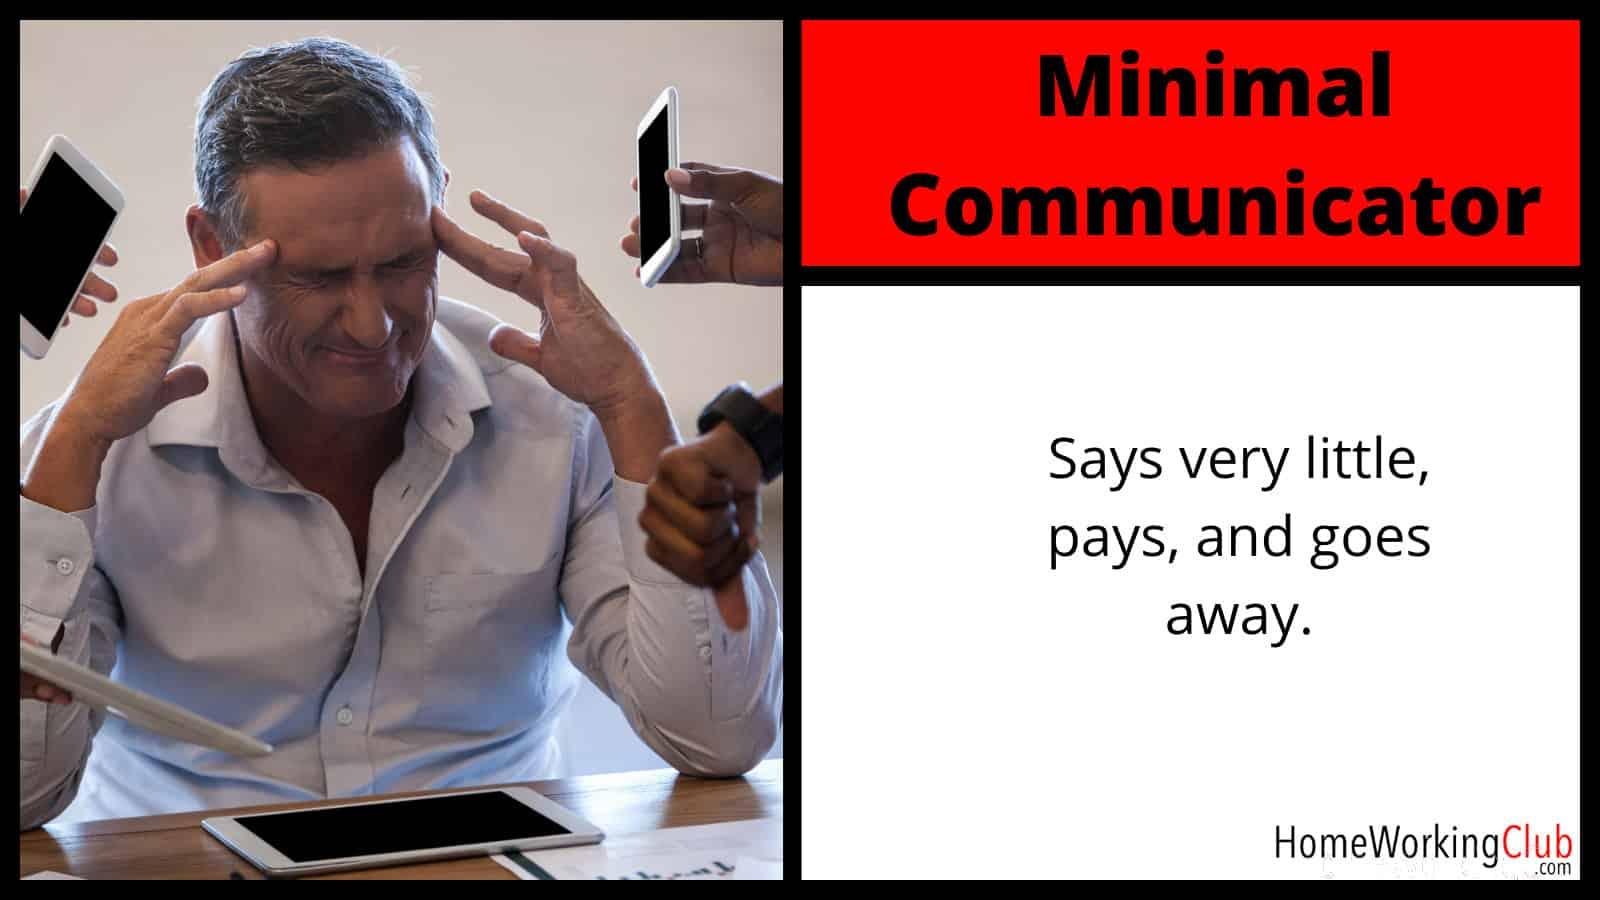 Client Type: Minimal Communicator